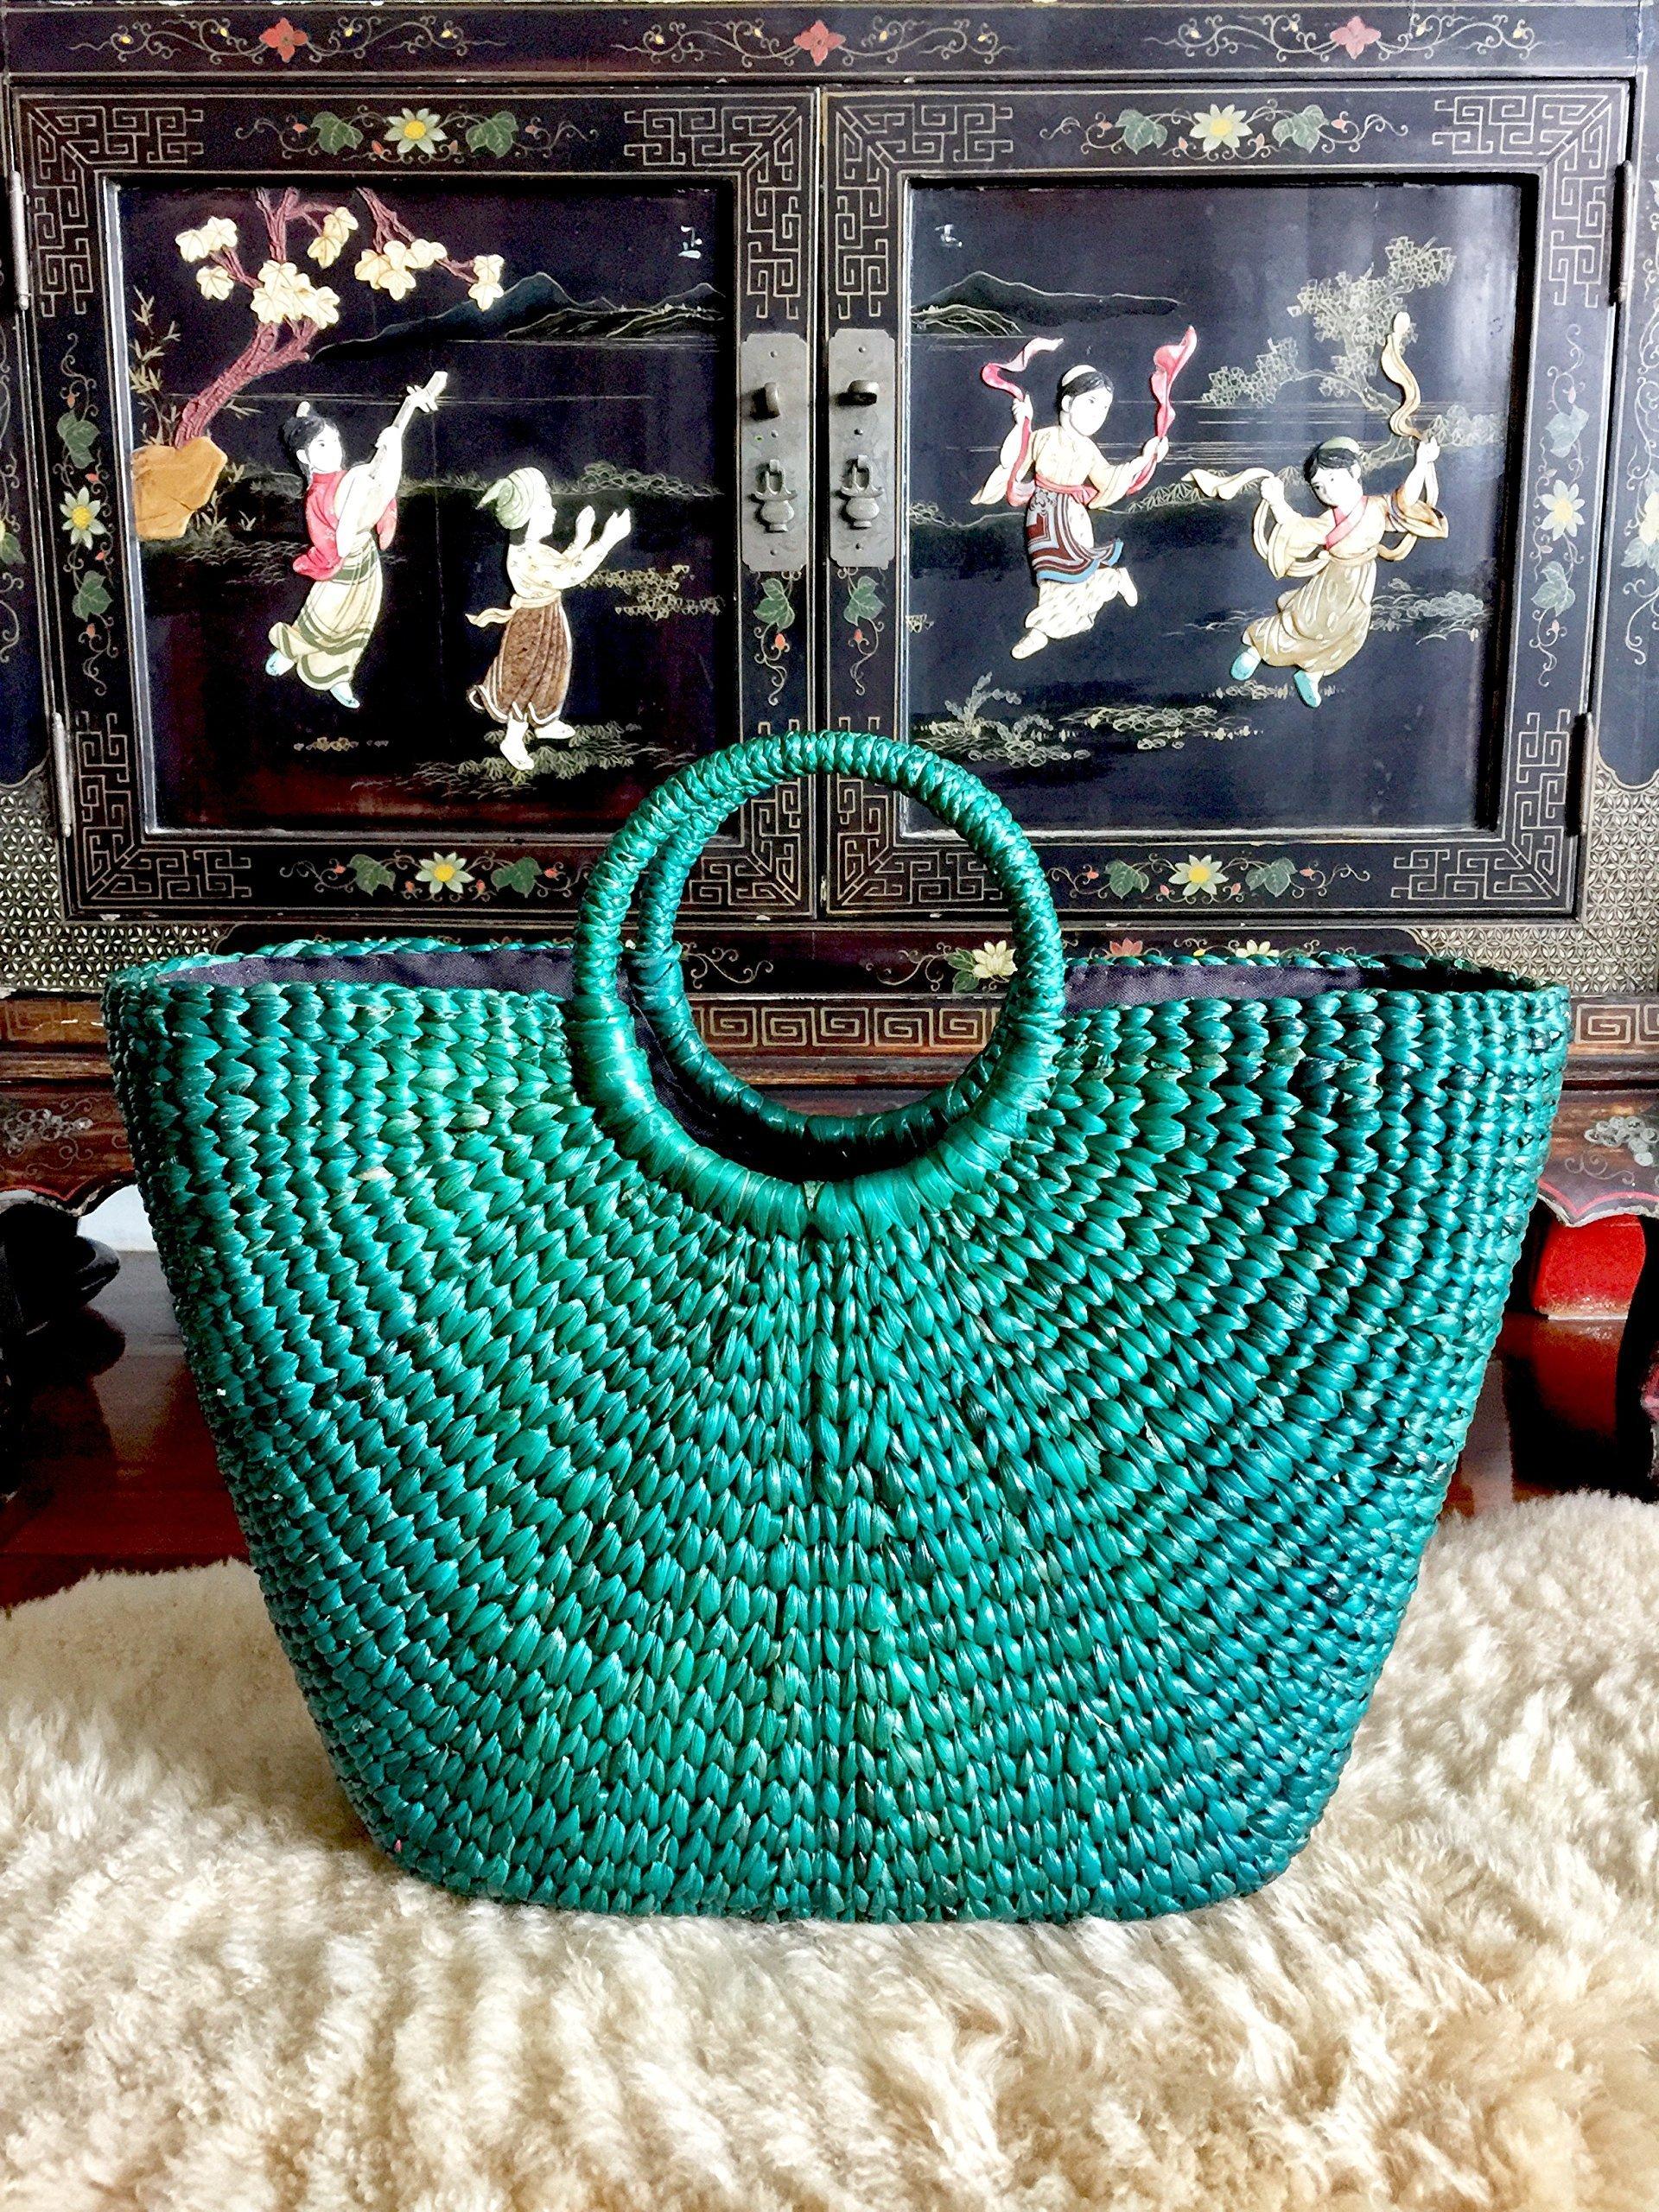 InfinityLoveCo Green Straw Bag,Straw Basket Tote,Straw Basket Bag,Market Basket Bags,Summer Straw Bag,Straw Basket Purse,Straw Tote Beach Bag,Straw Tote